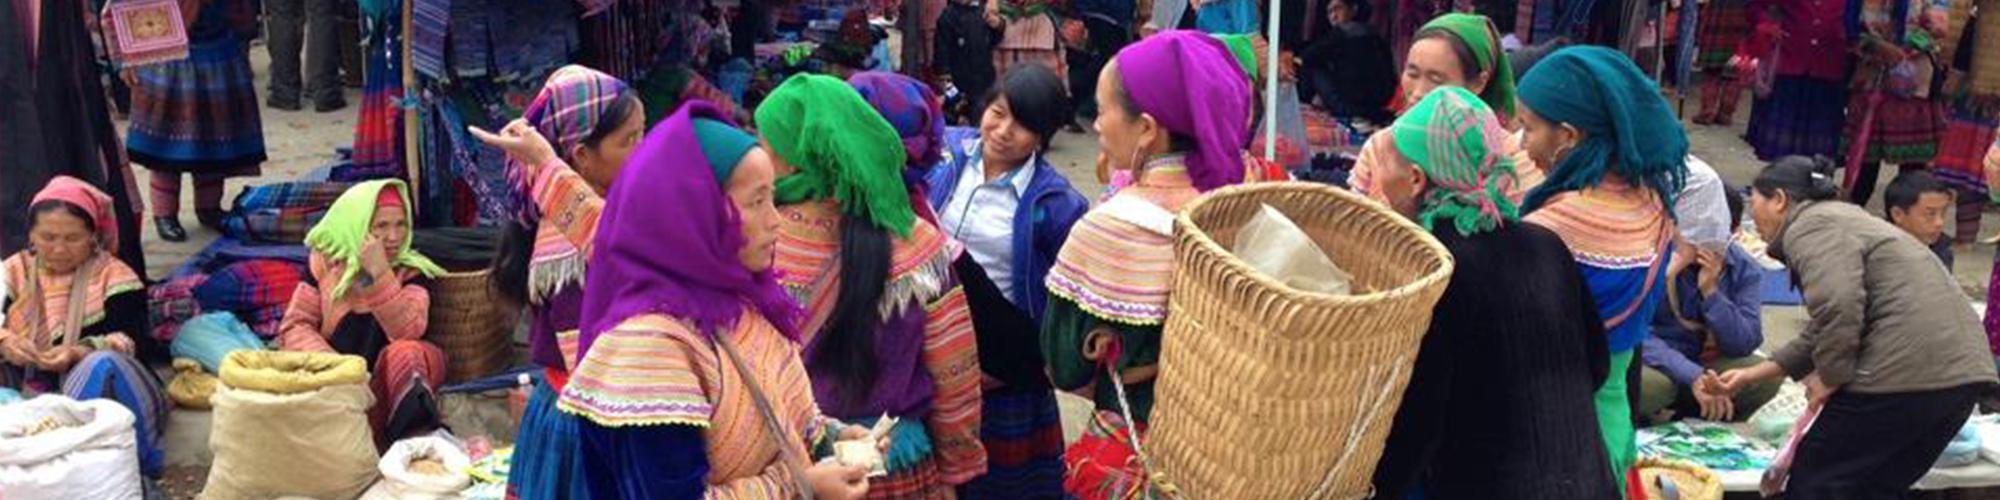 Bac Ha Markt am Sonntag